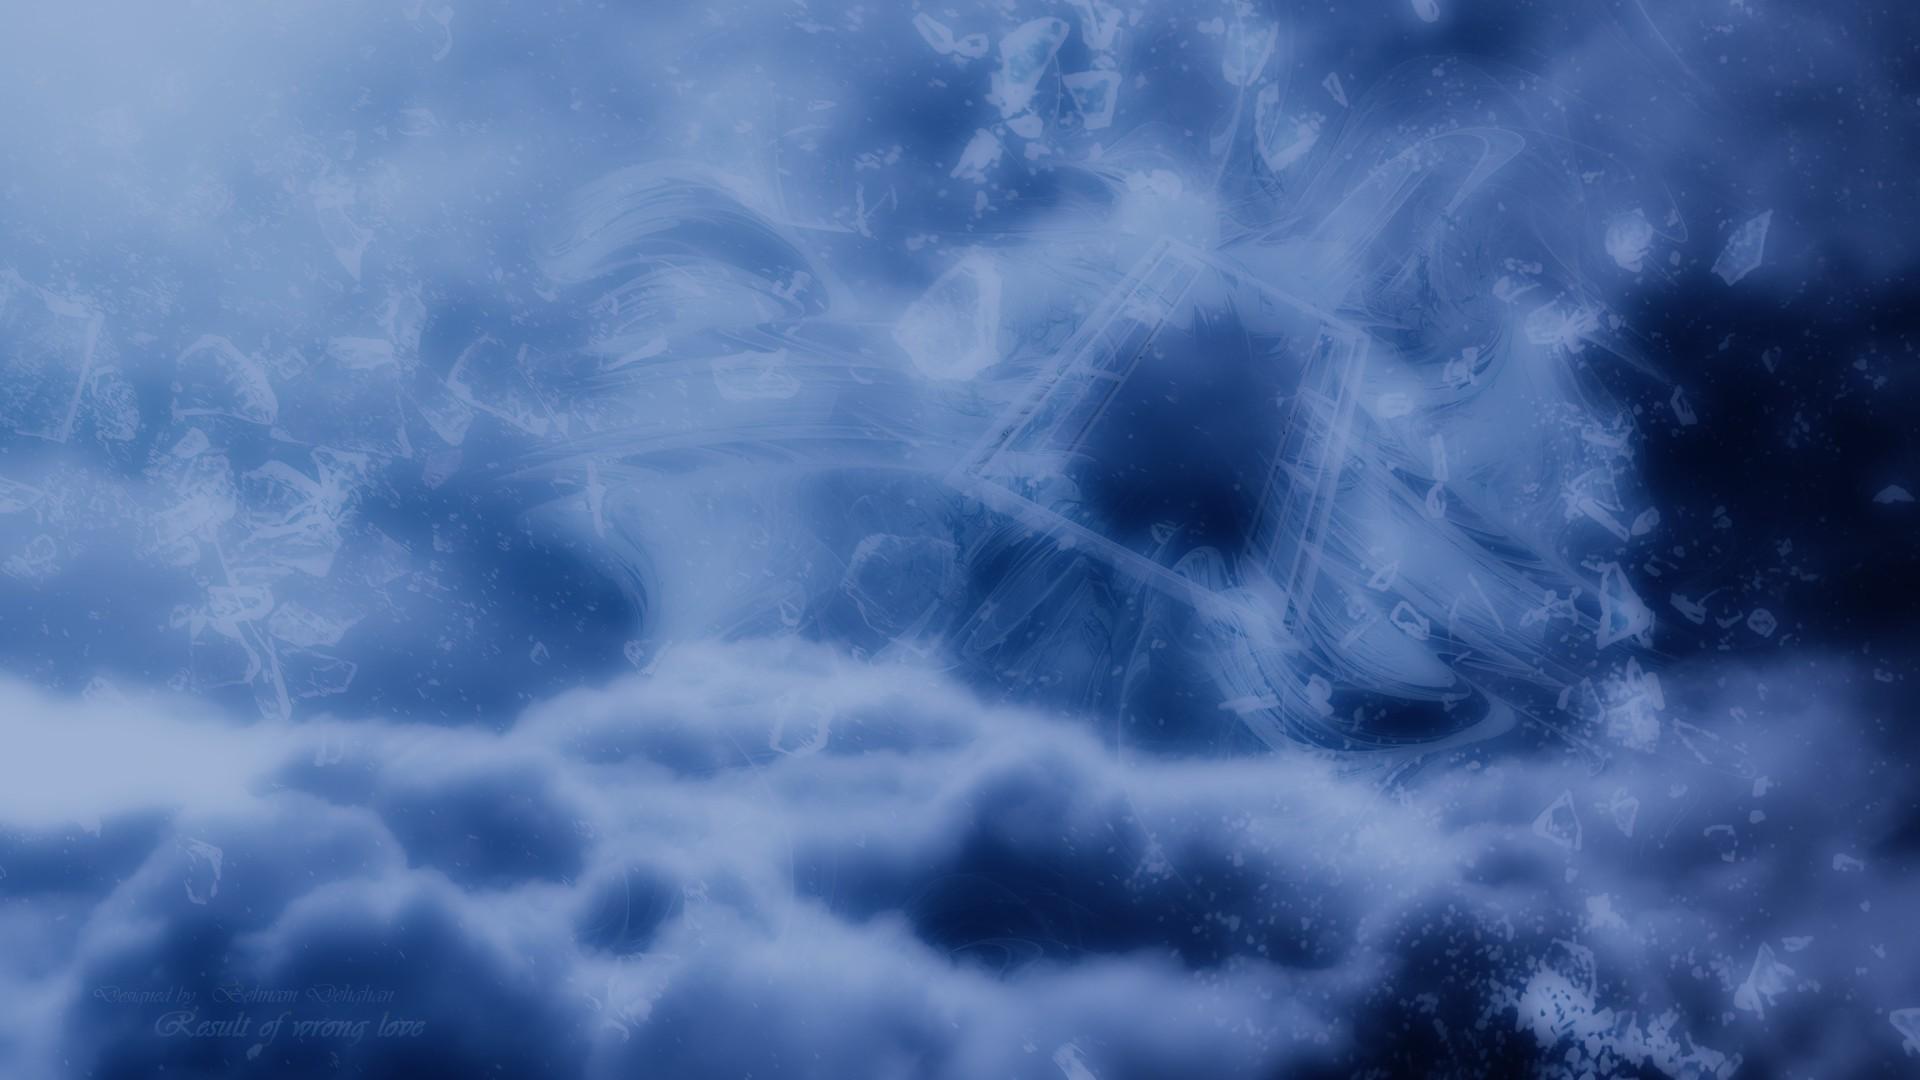 Blue clouds love dark design patterns templates textures backgrounds skies  wallpaper | | 192246 | WallpaperUP